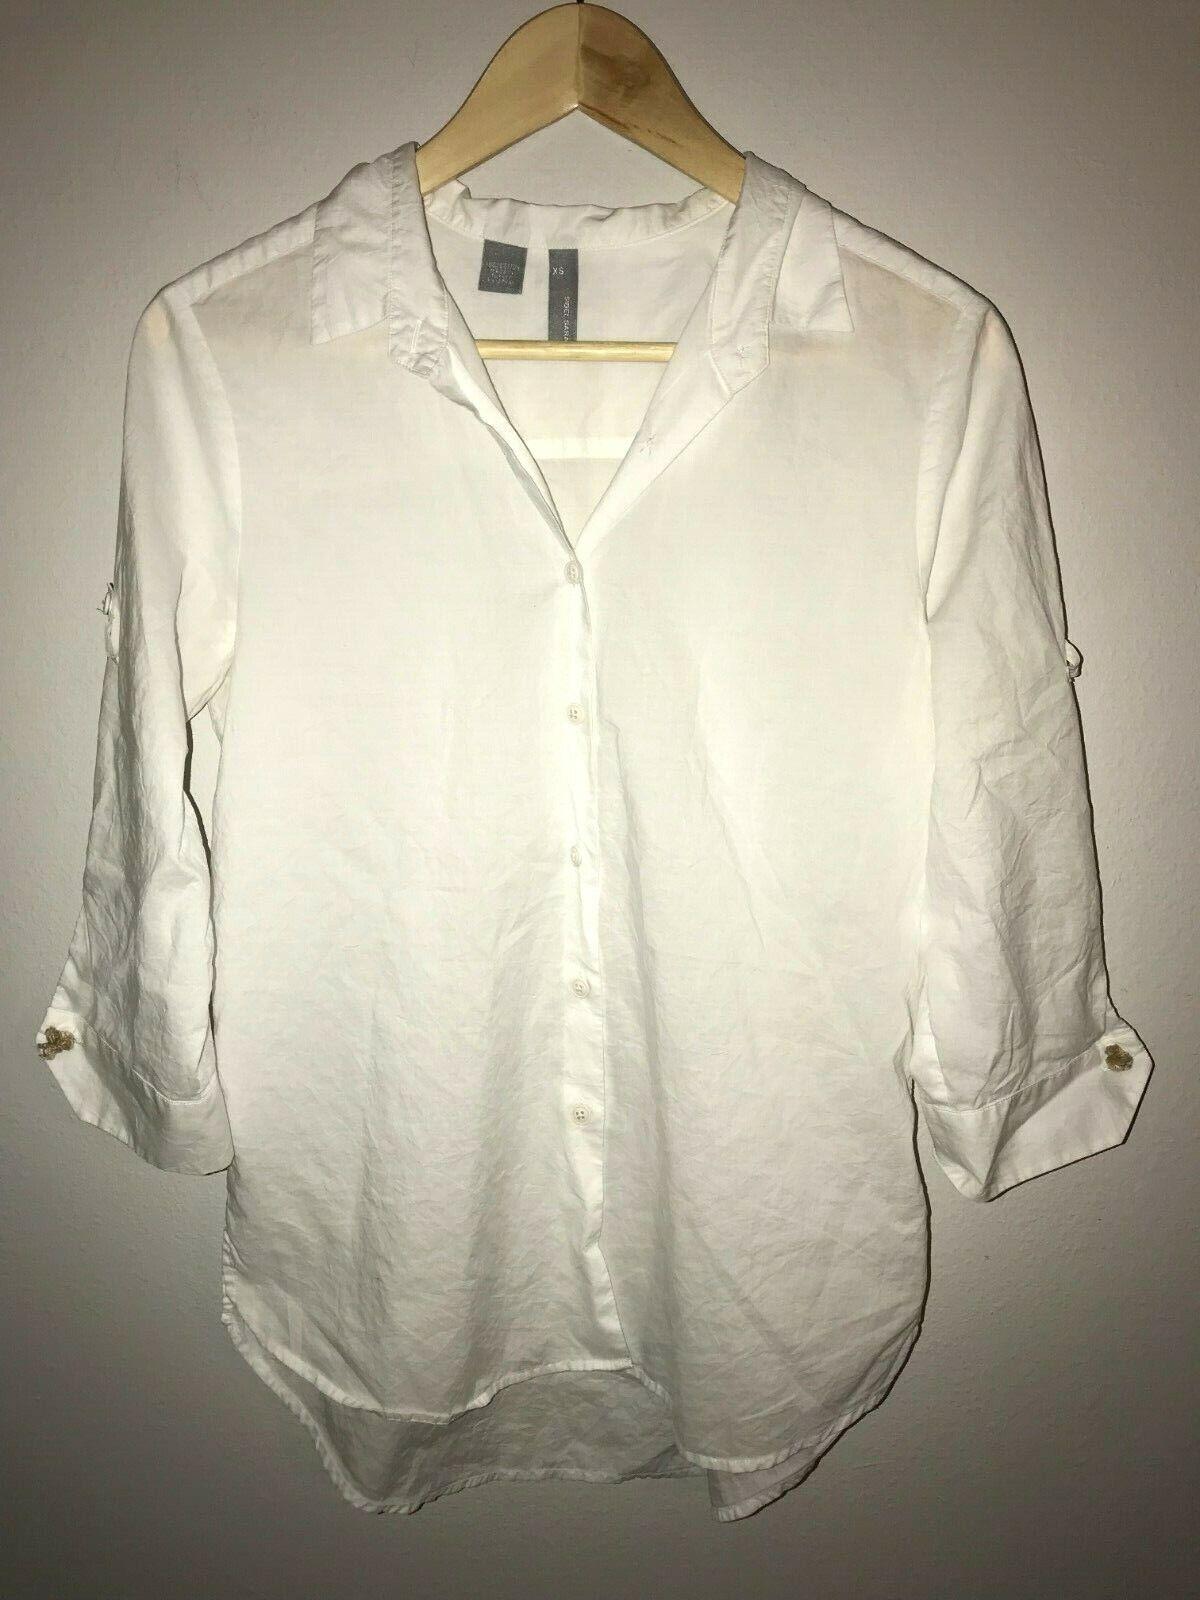 Women's Sibel Saral 100% Cotton White Button Up Blouse - Size XS